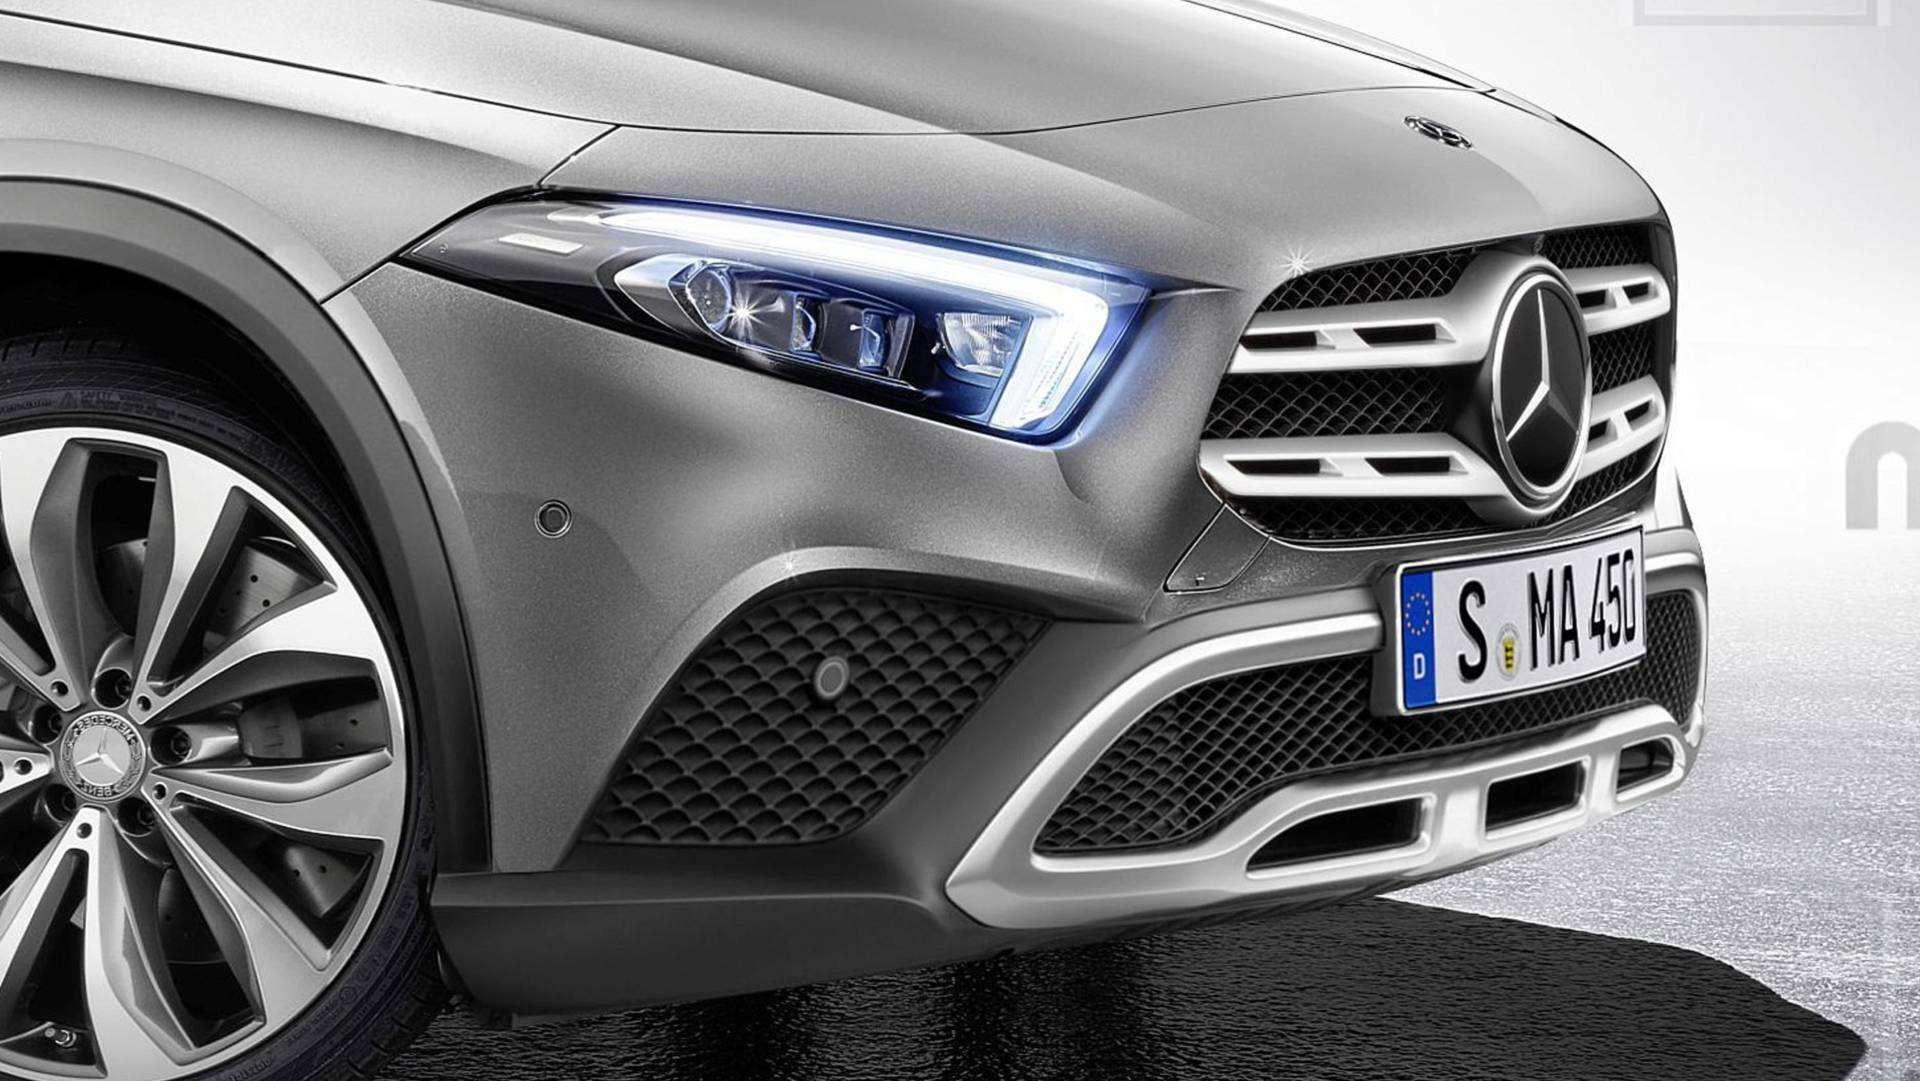 65 Gallery of Mercedes Gla 2019 Rumors for Mercedes Gla 2019